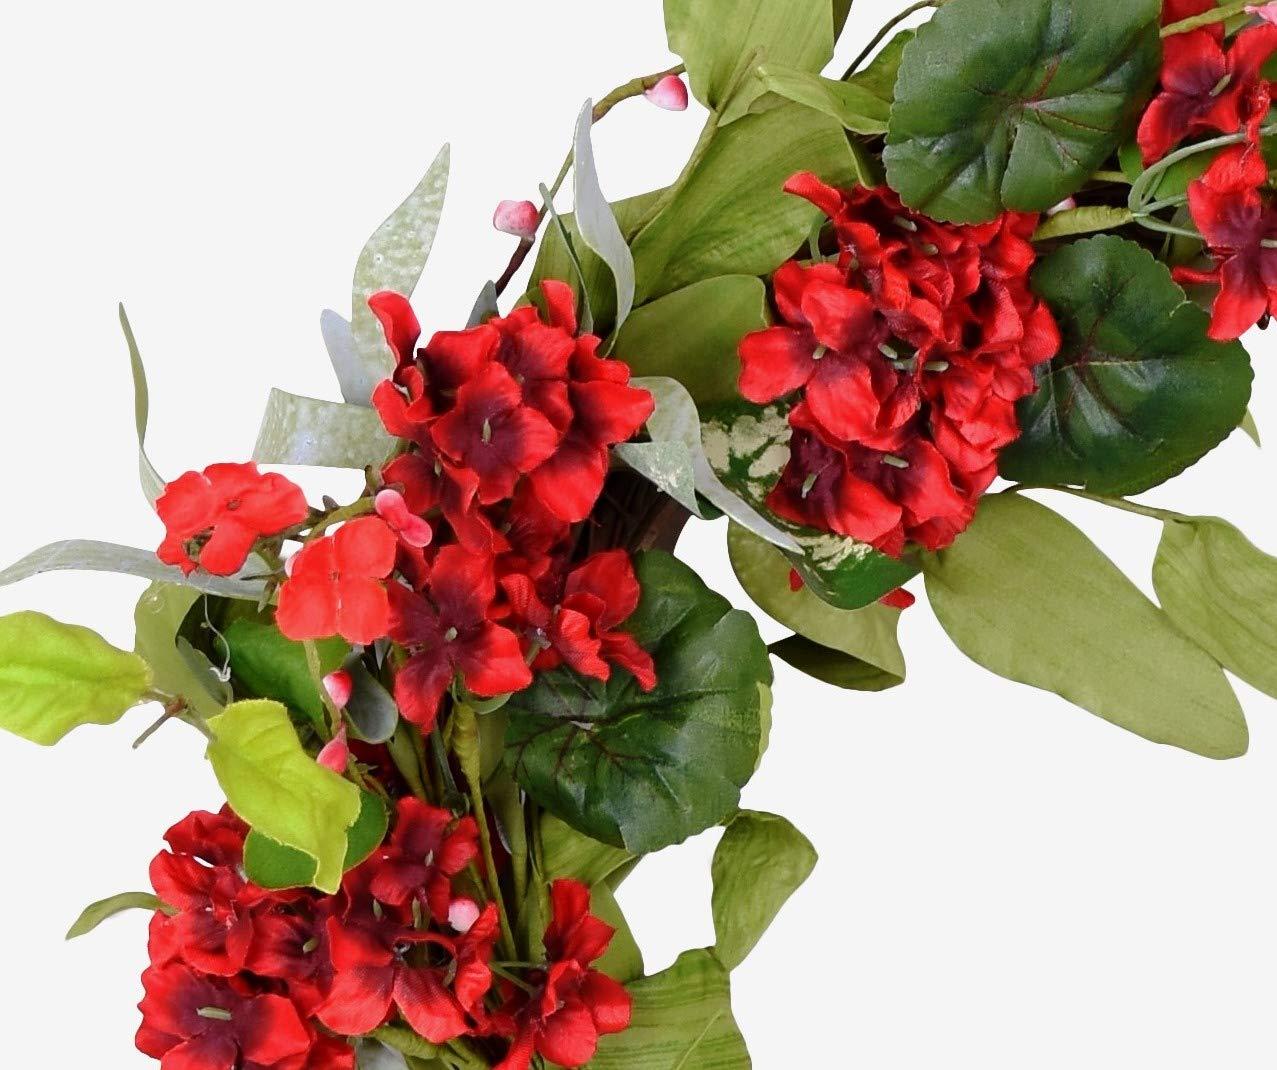 Ten Waterloo 22 Inch Red Artificial Geranium Wreath on Natural Twig Base